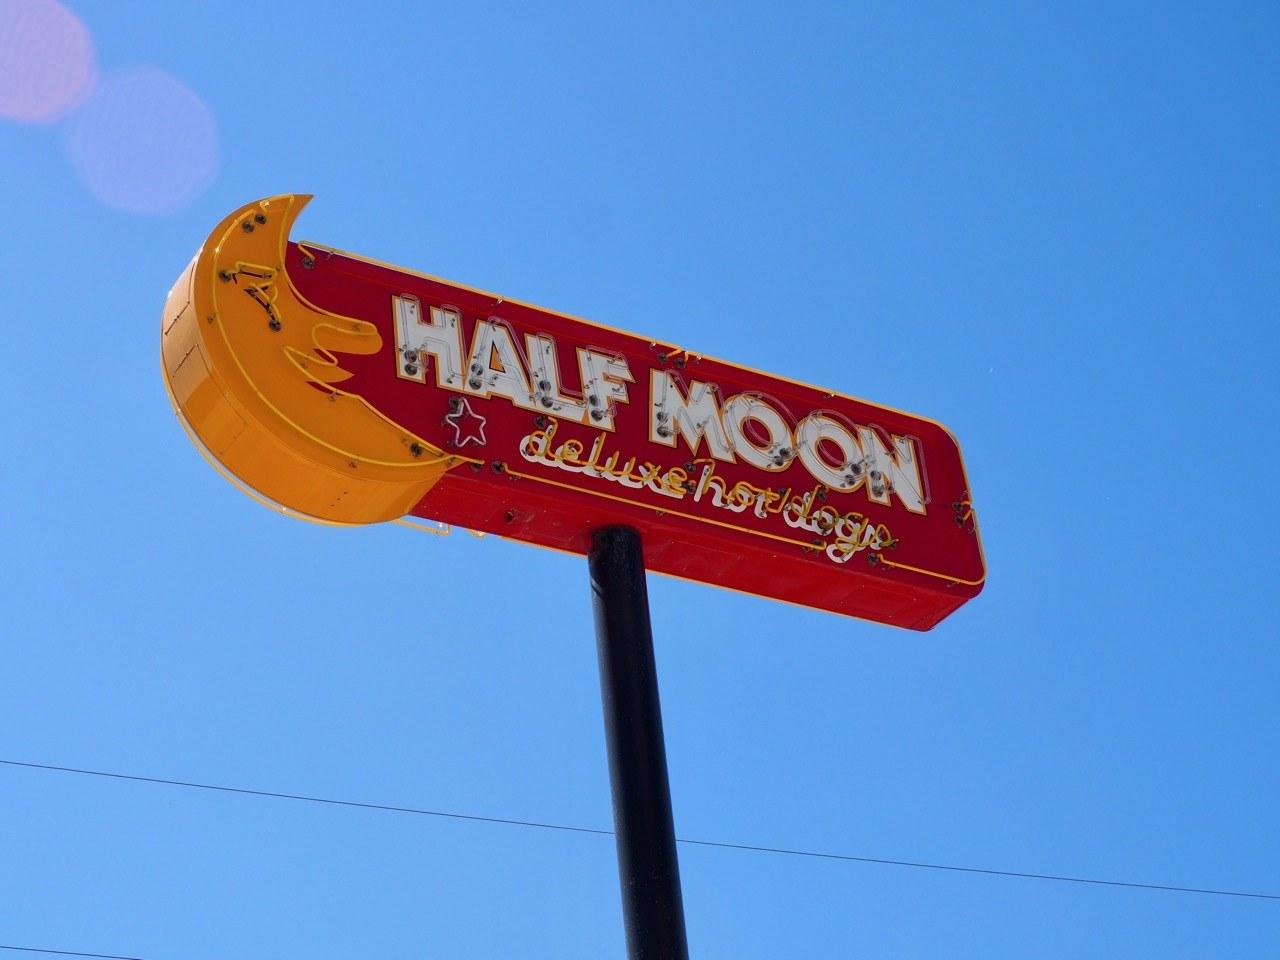 Half Moon Manitoba